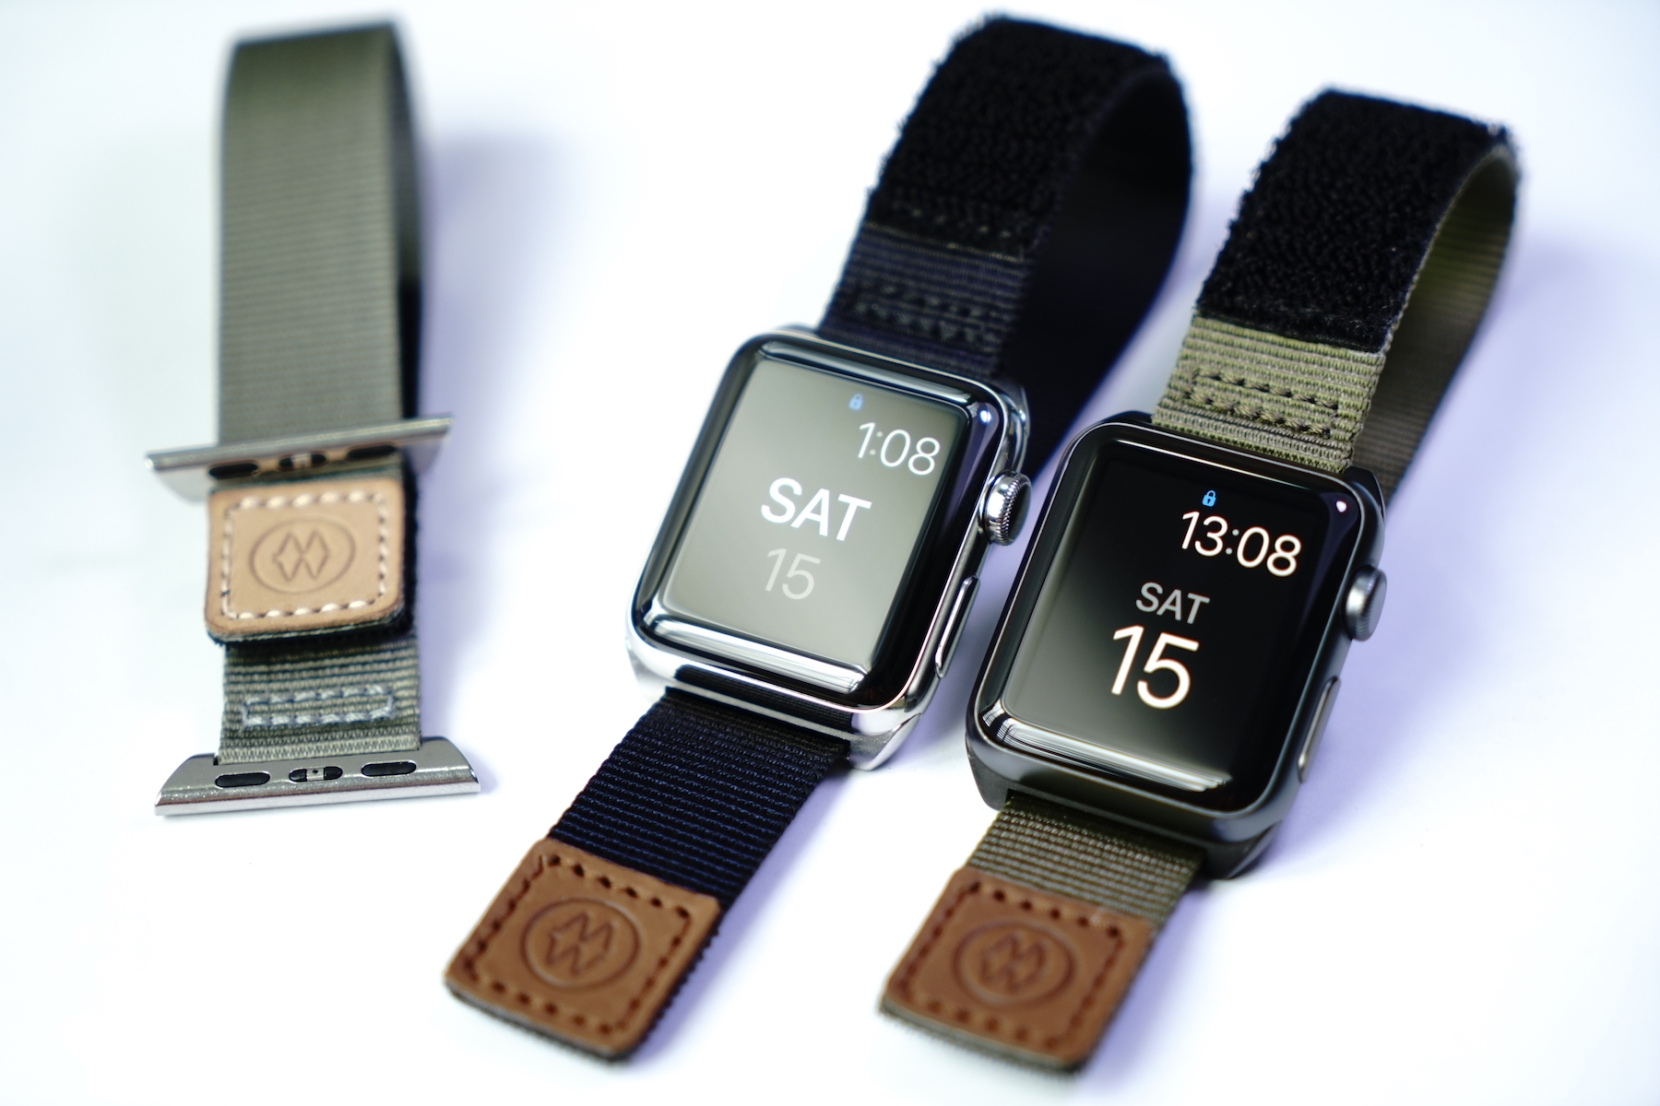 monowear-nylon-active-apple-watch-band-14